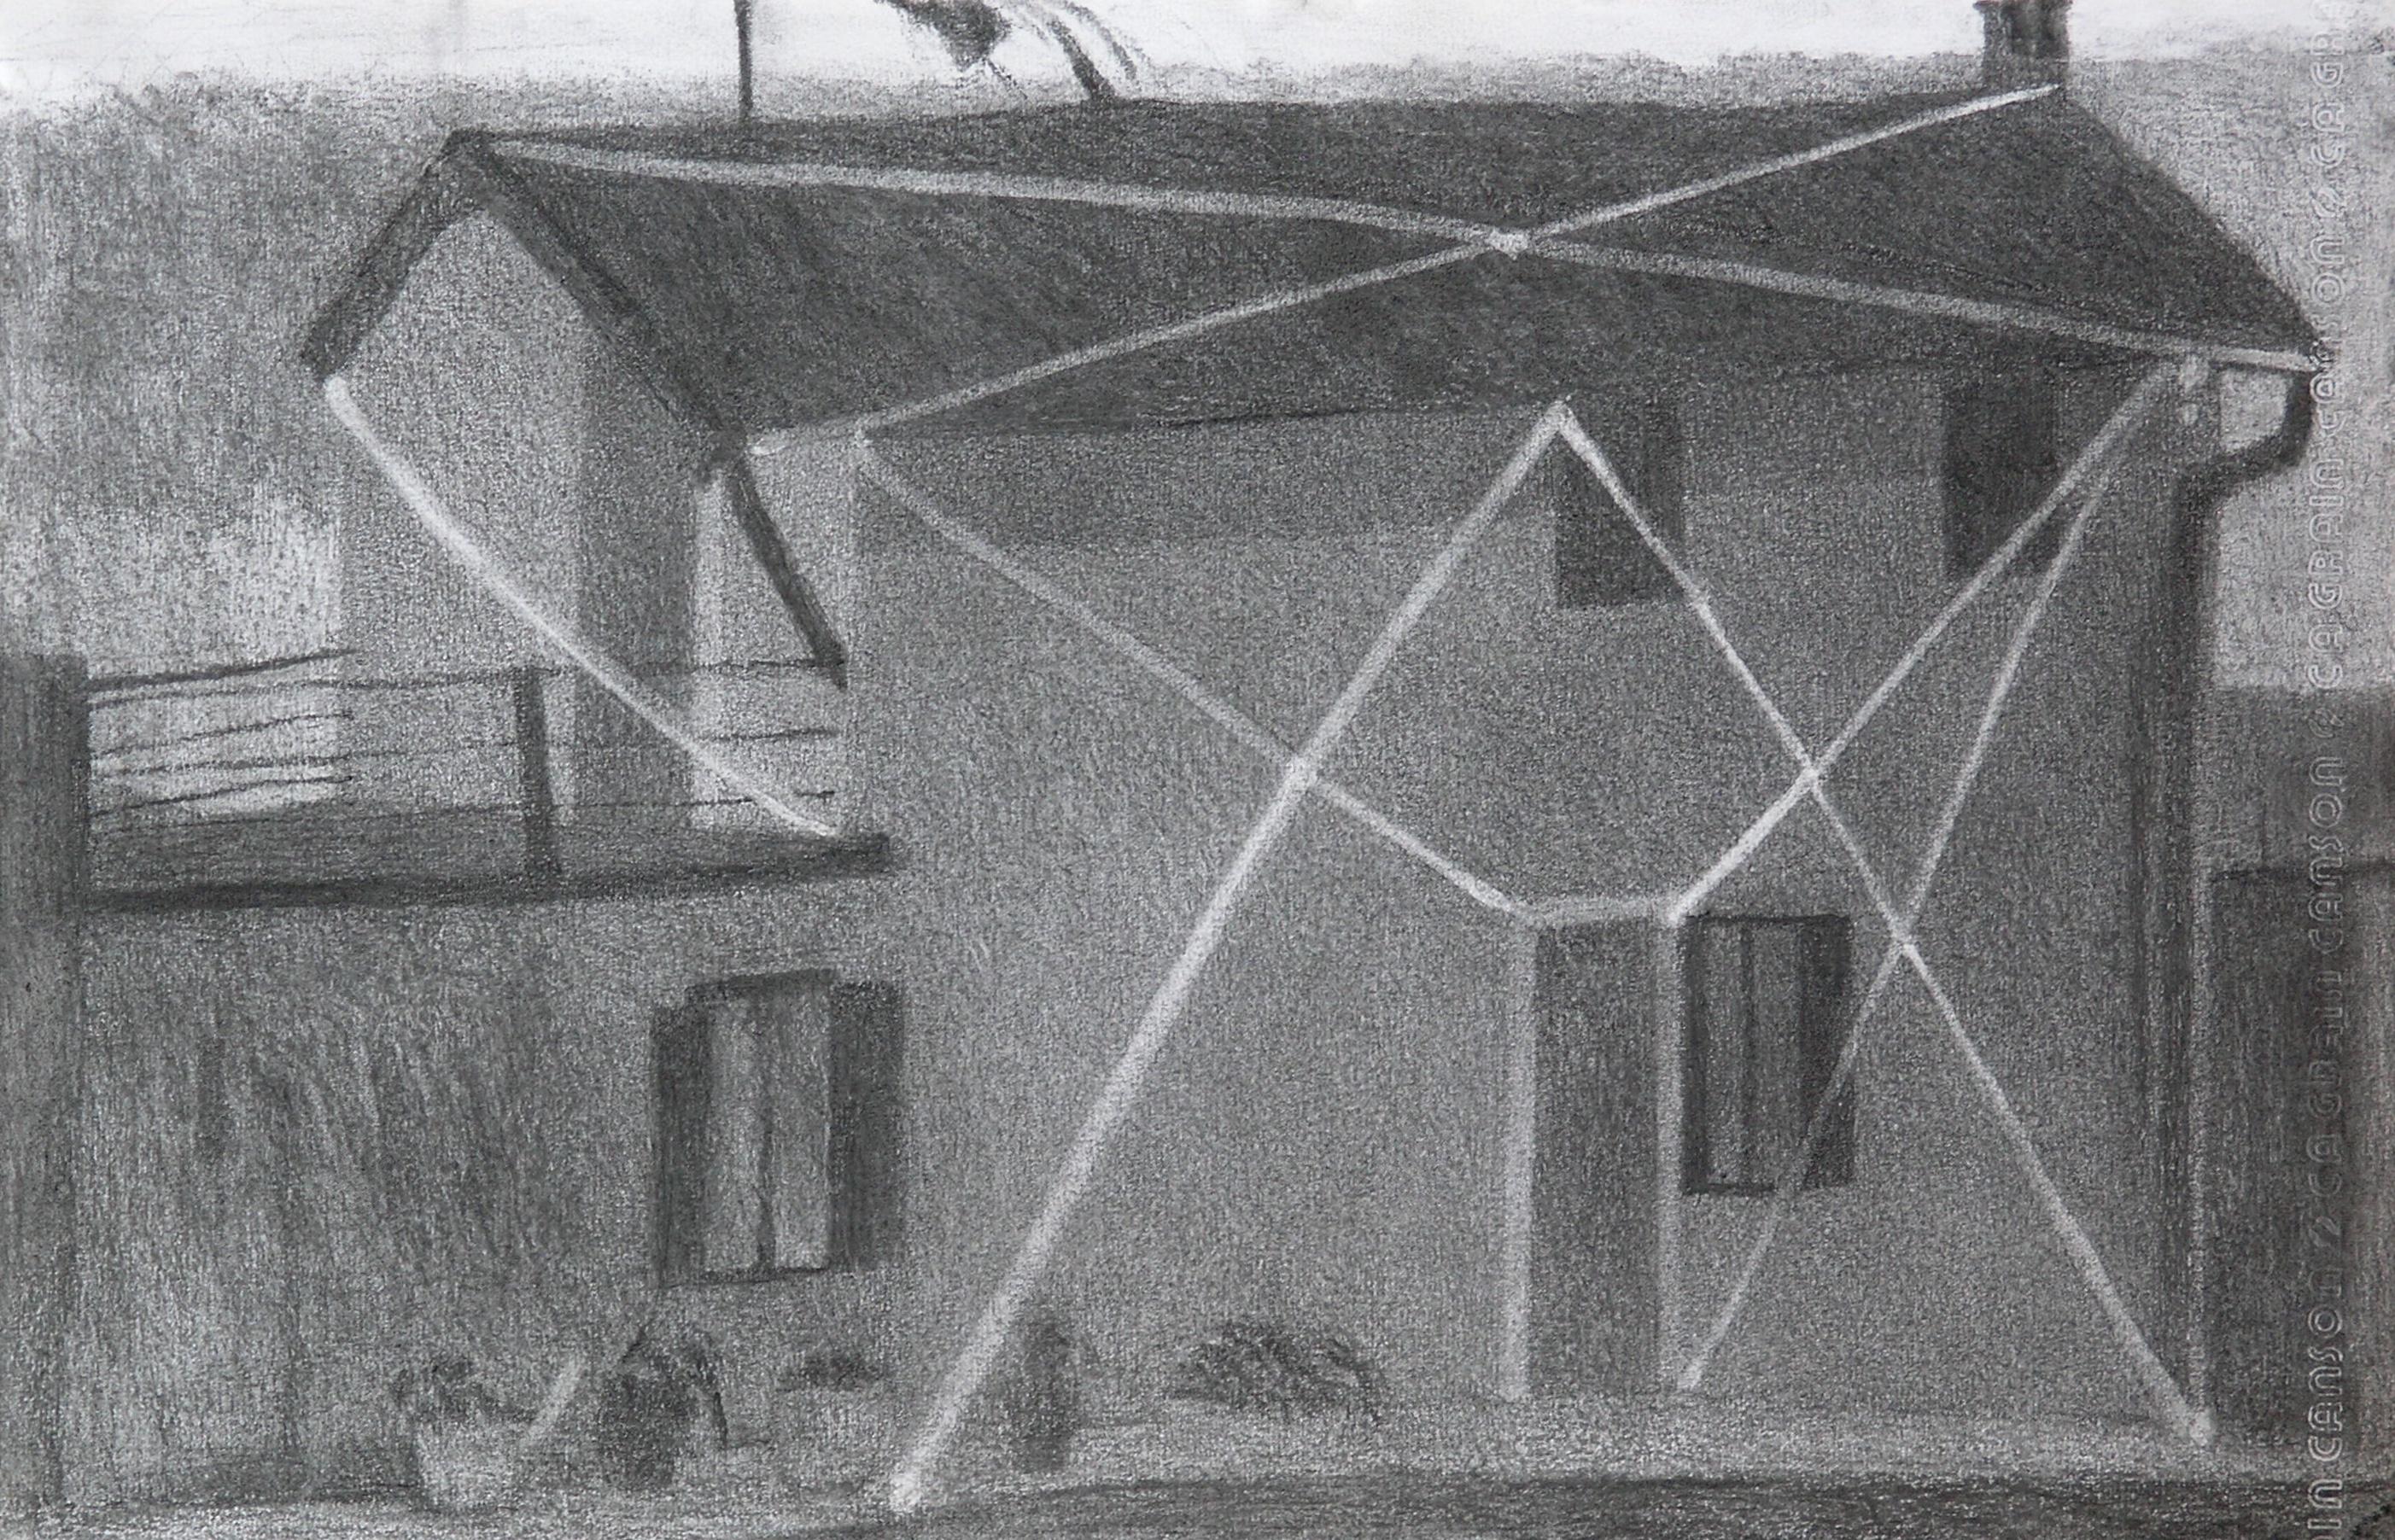 Postman's house 3